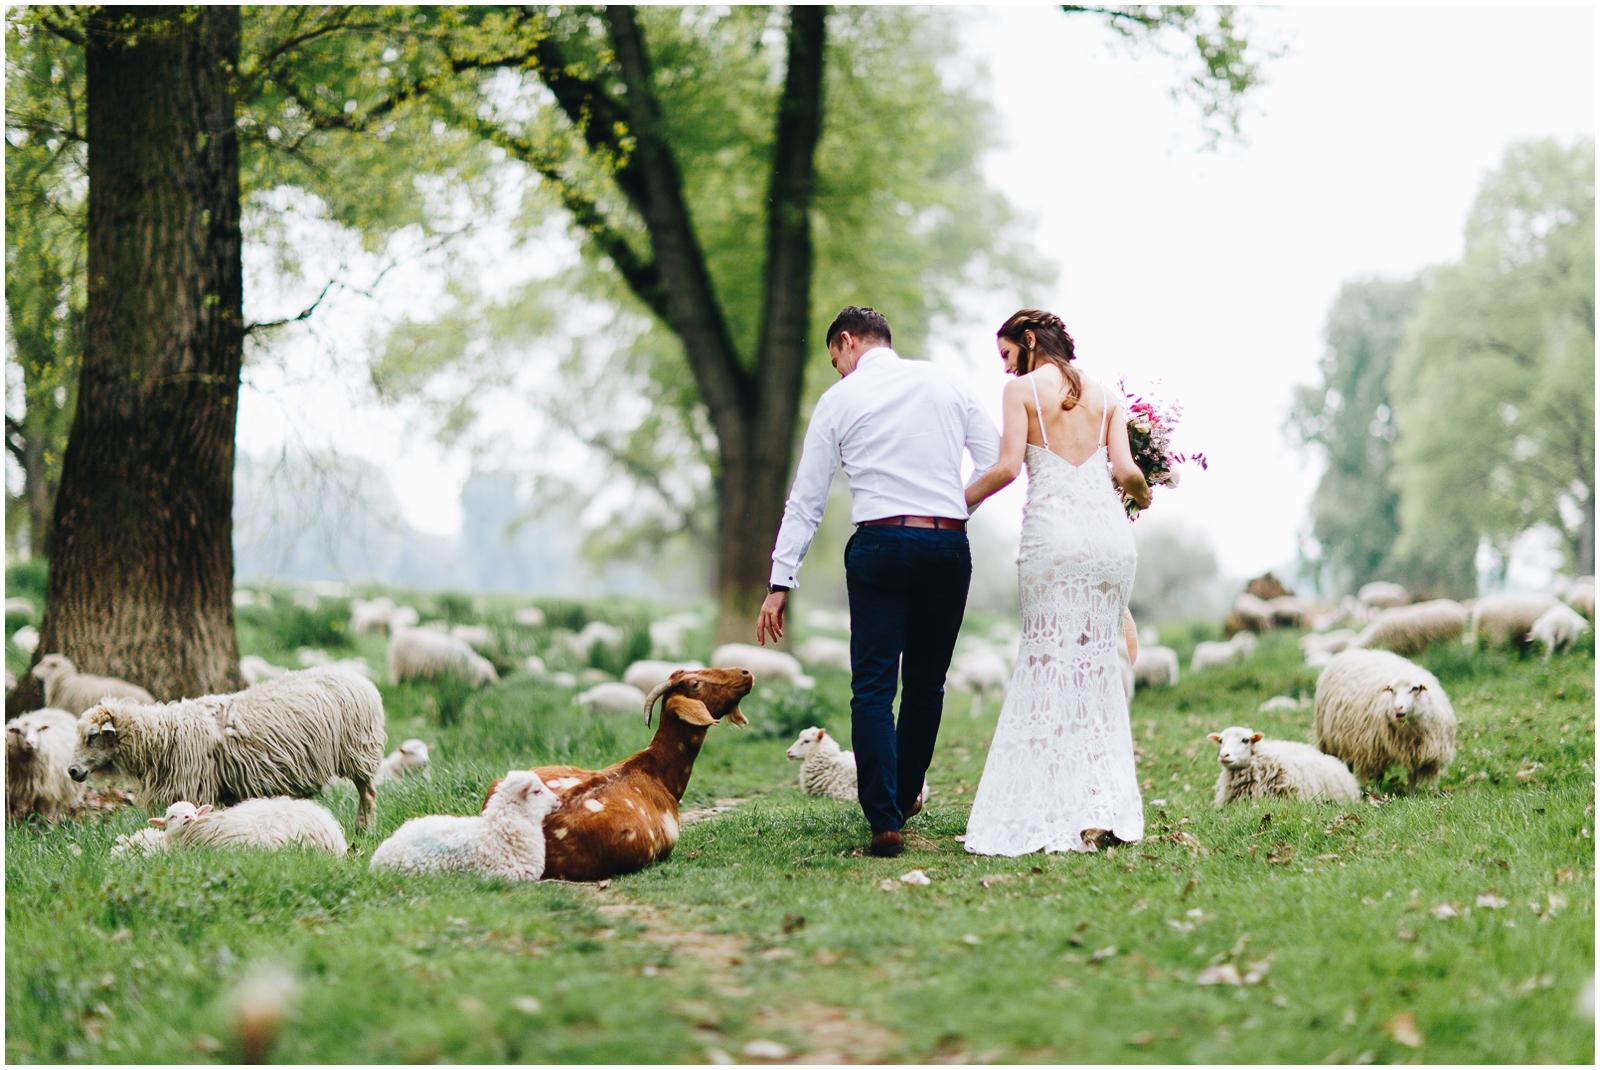 LE HAI LINH Photography-Hochzeitsfotograf-Bohohochzeit-_0049.jpg